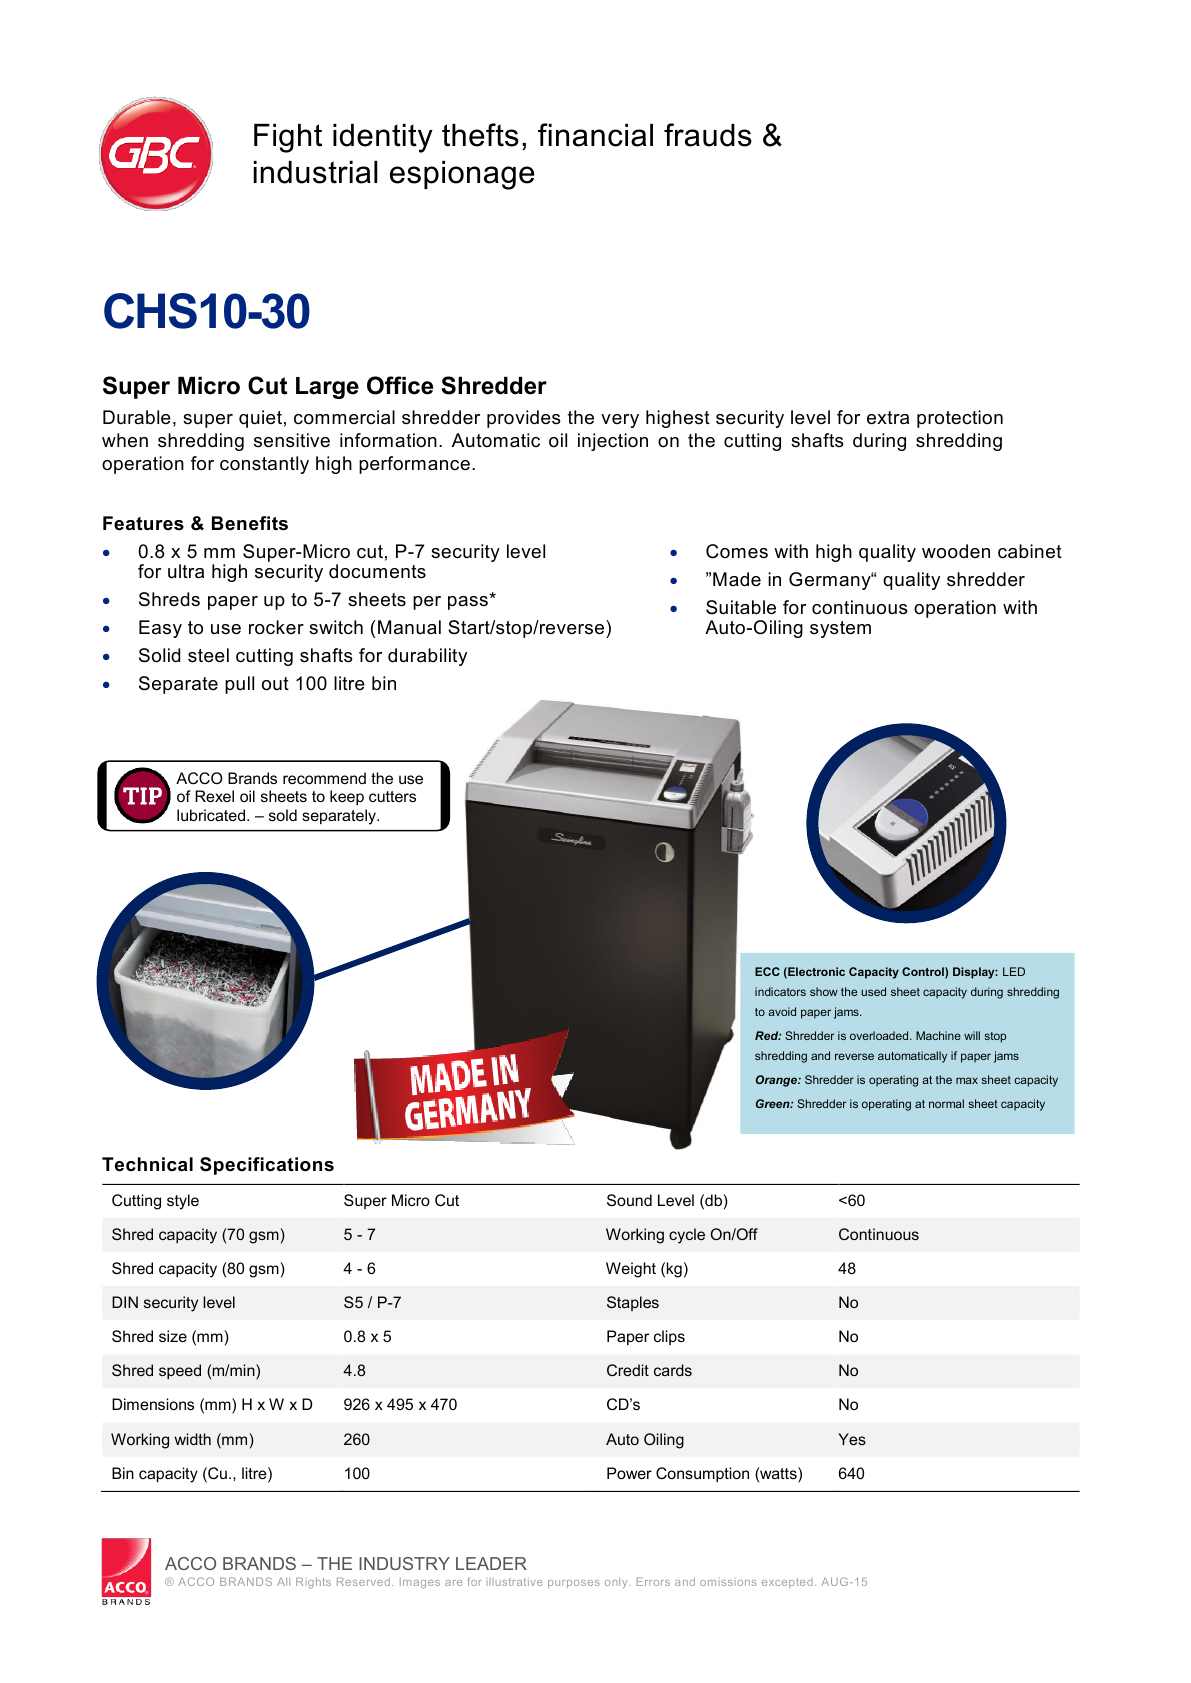 datasheet-chs10-30.png